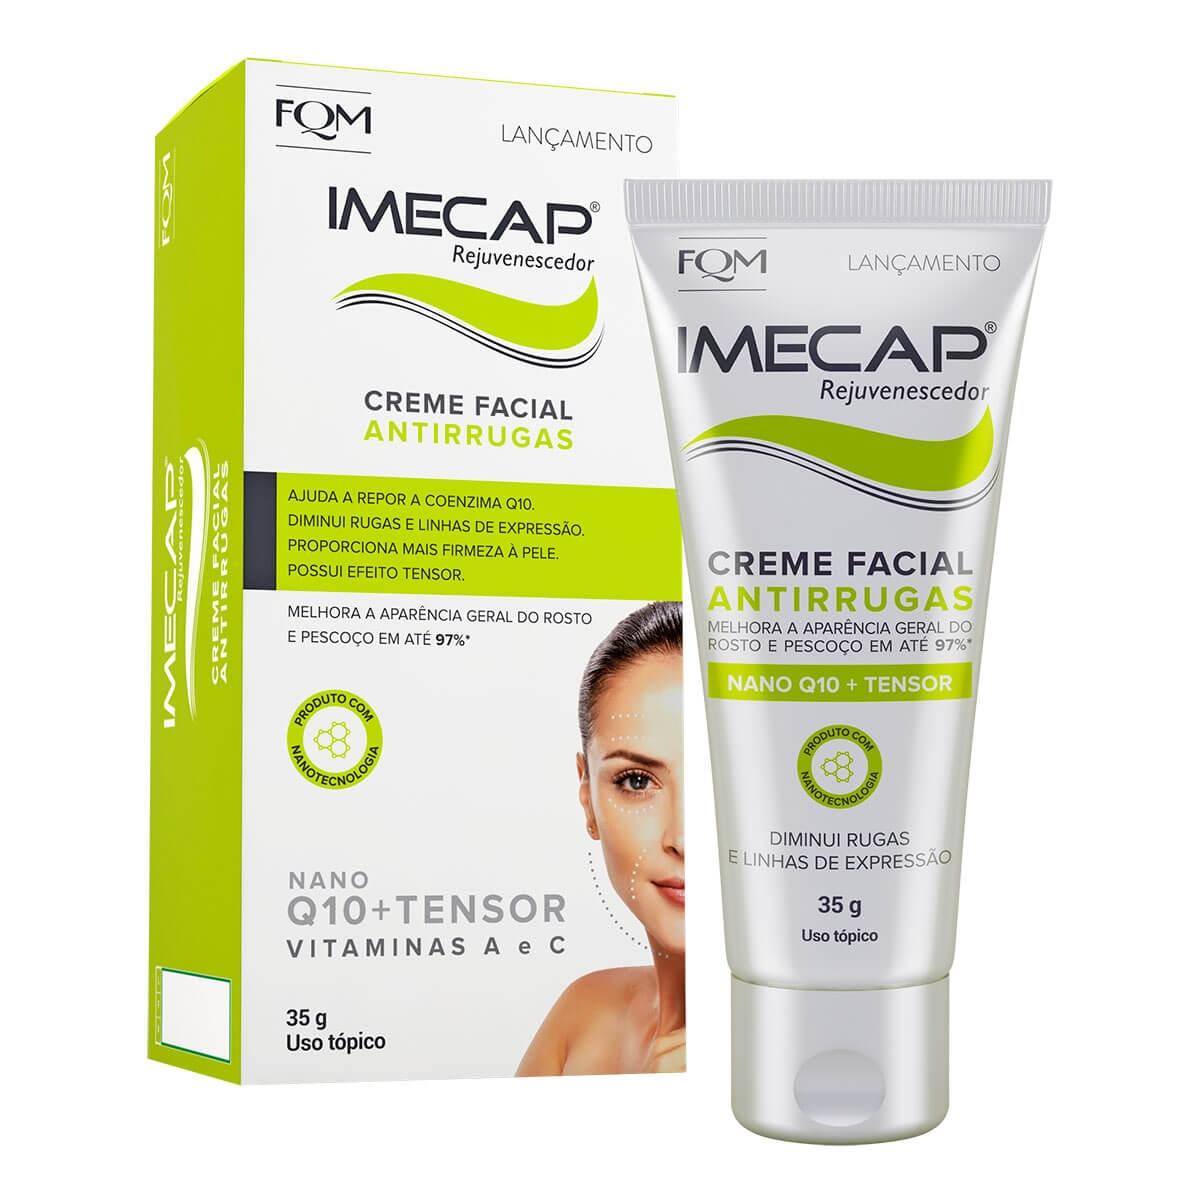 Creme Facial Antirrugas Imecap Rejuvenescedor 35g